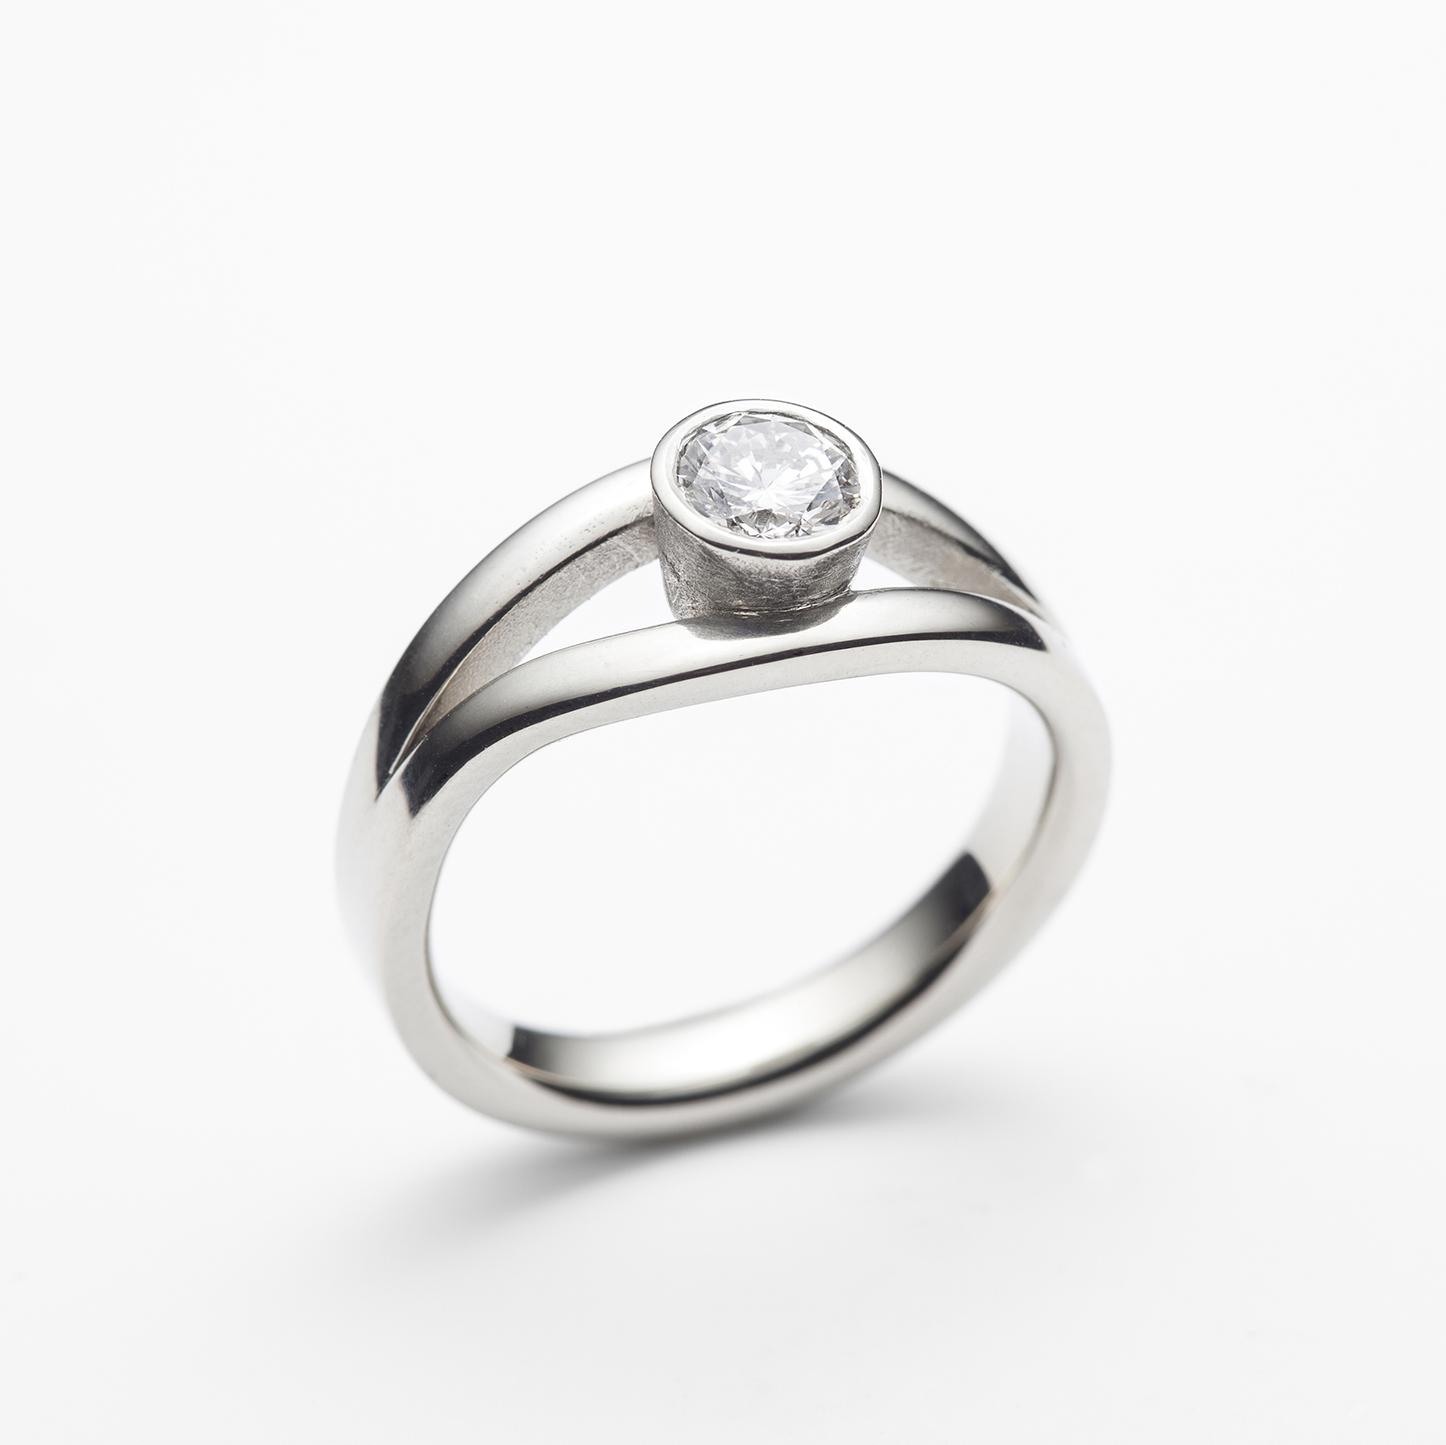 Abi's engagement ring copy.jpg